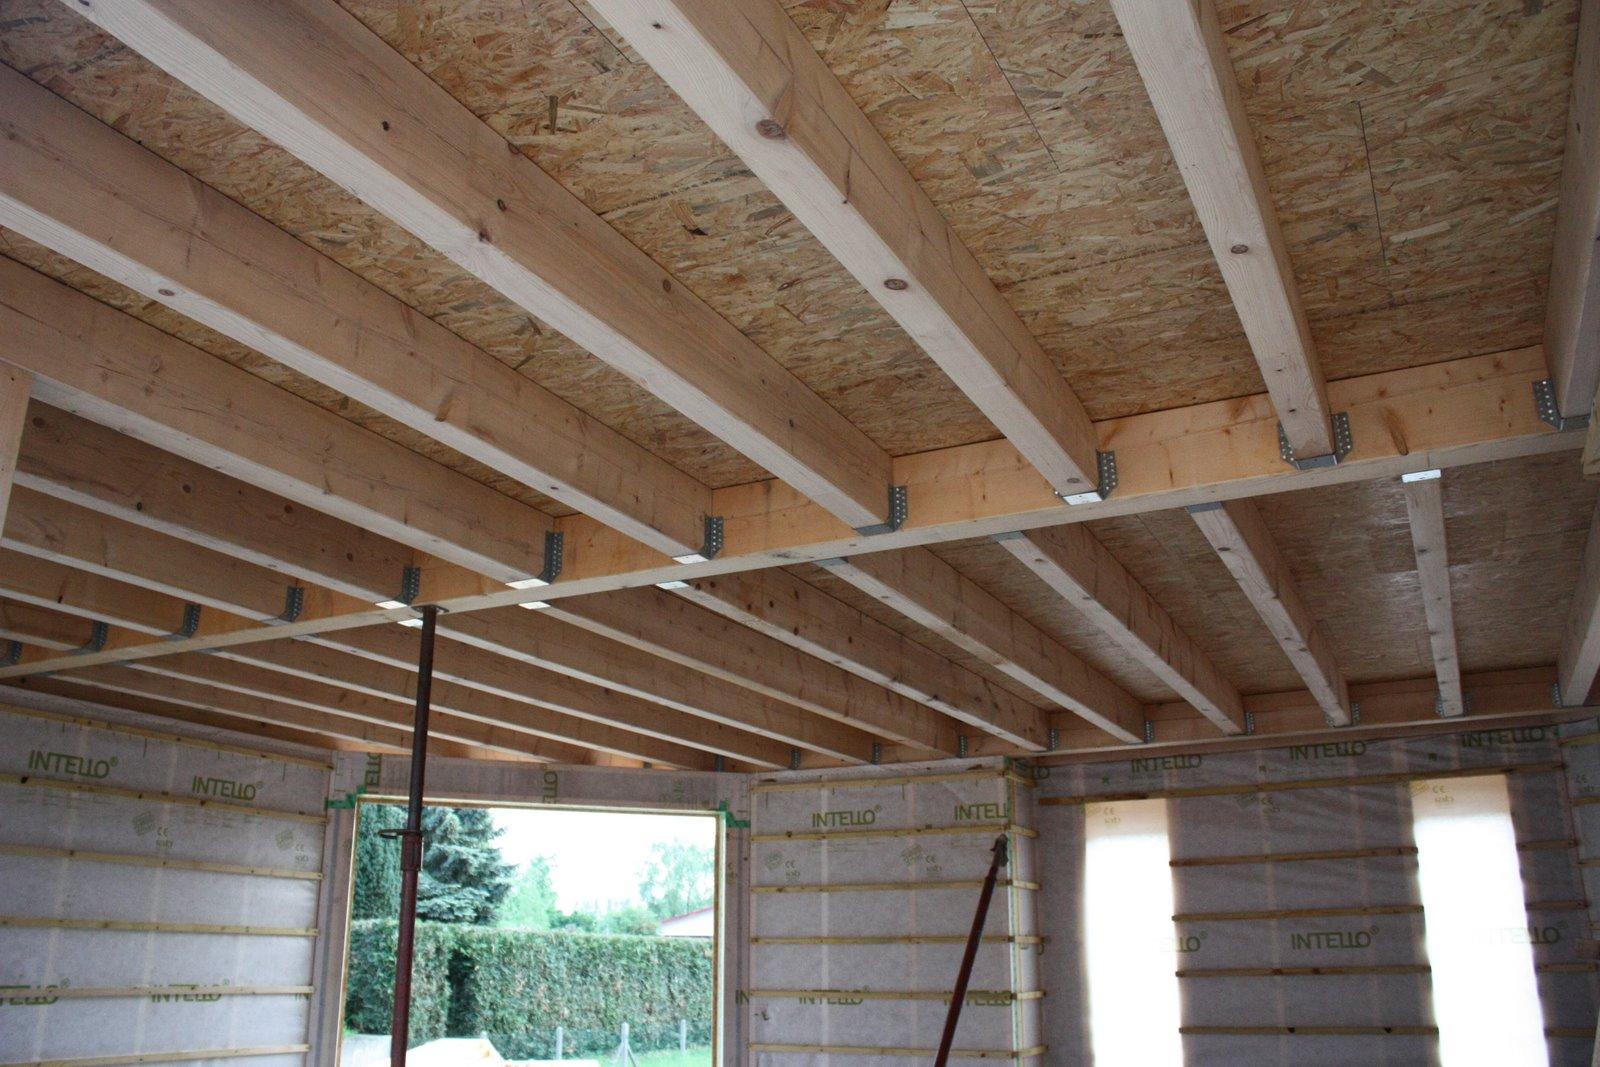 isolation plancher bois etage 28 images isolation. Black Bedroom Furniture Sets. Home Design Ideas